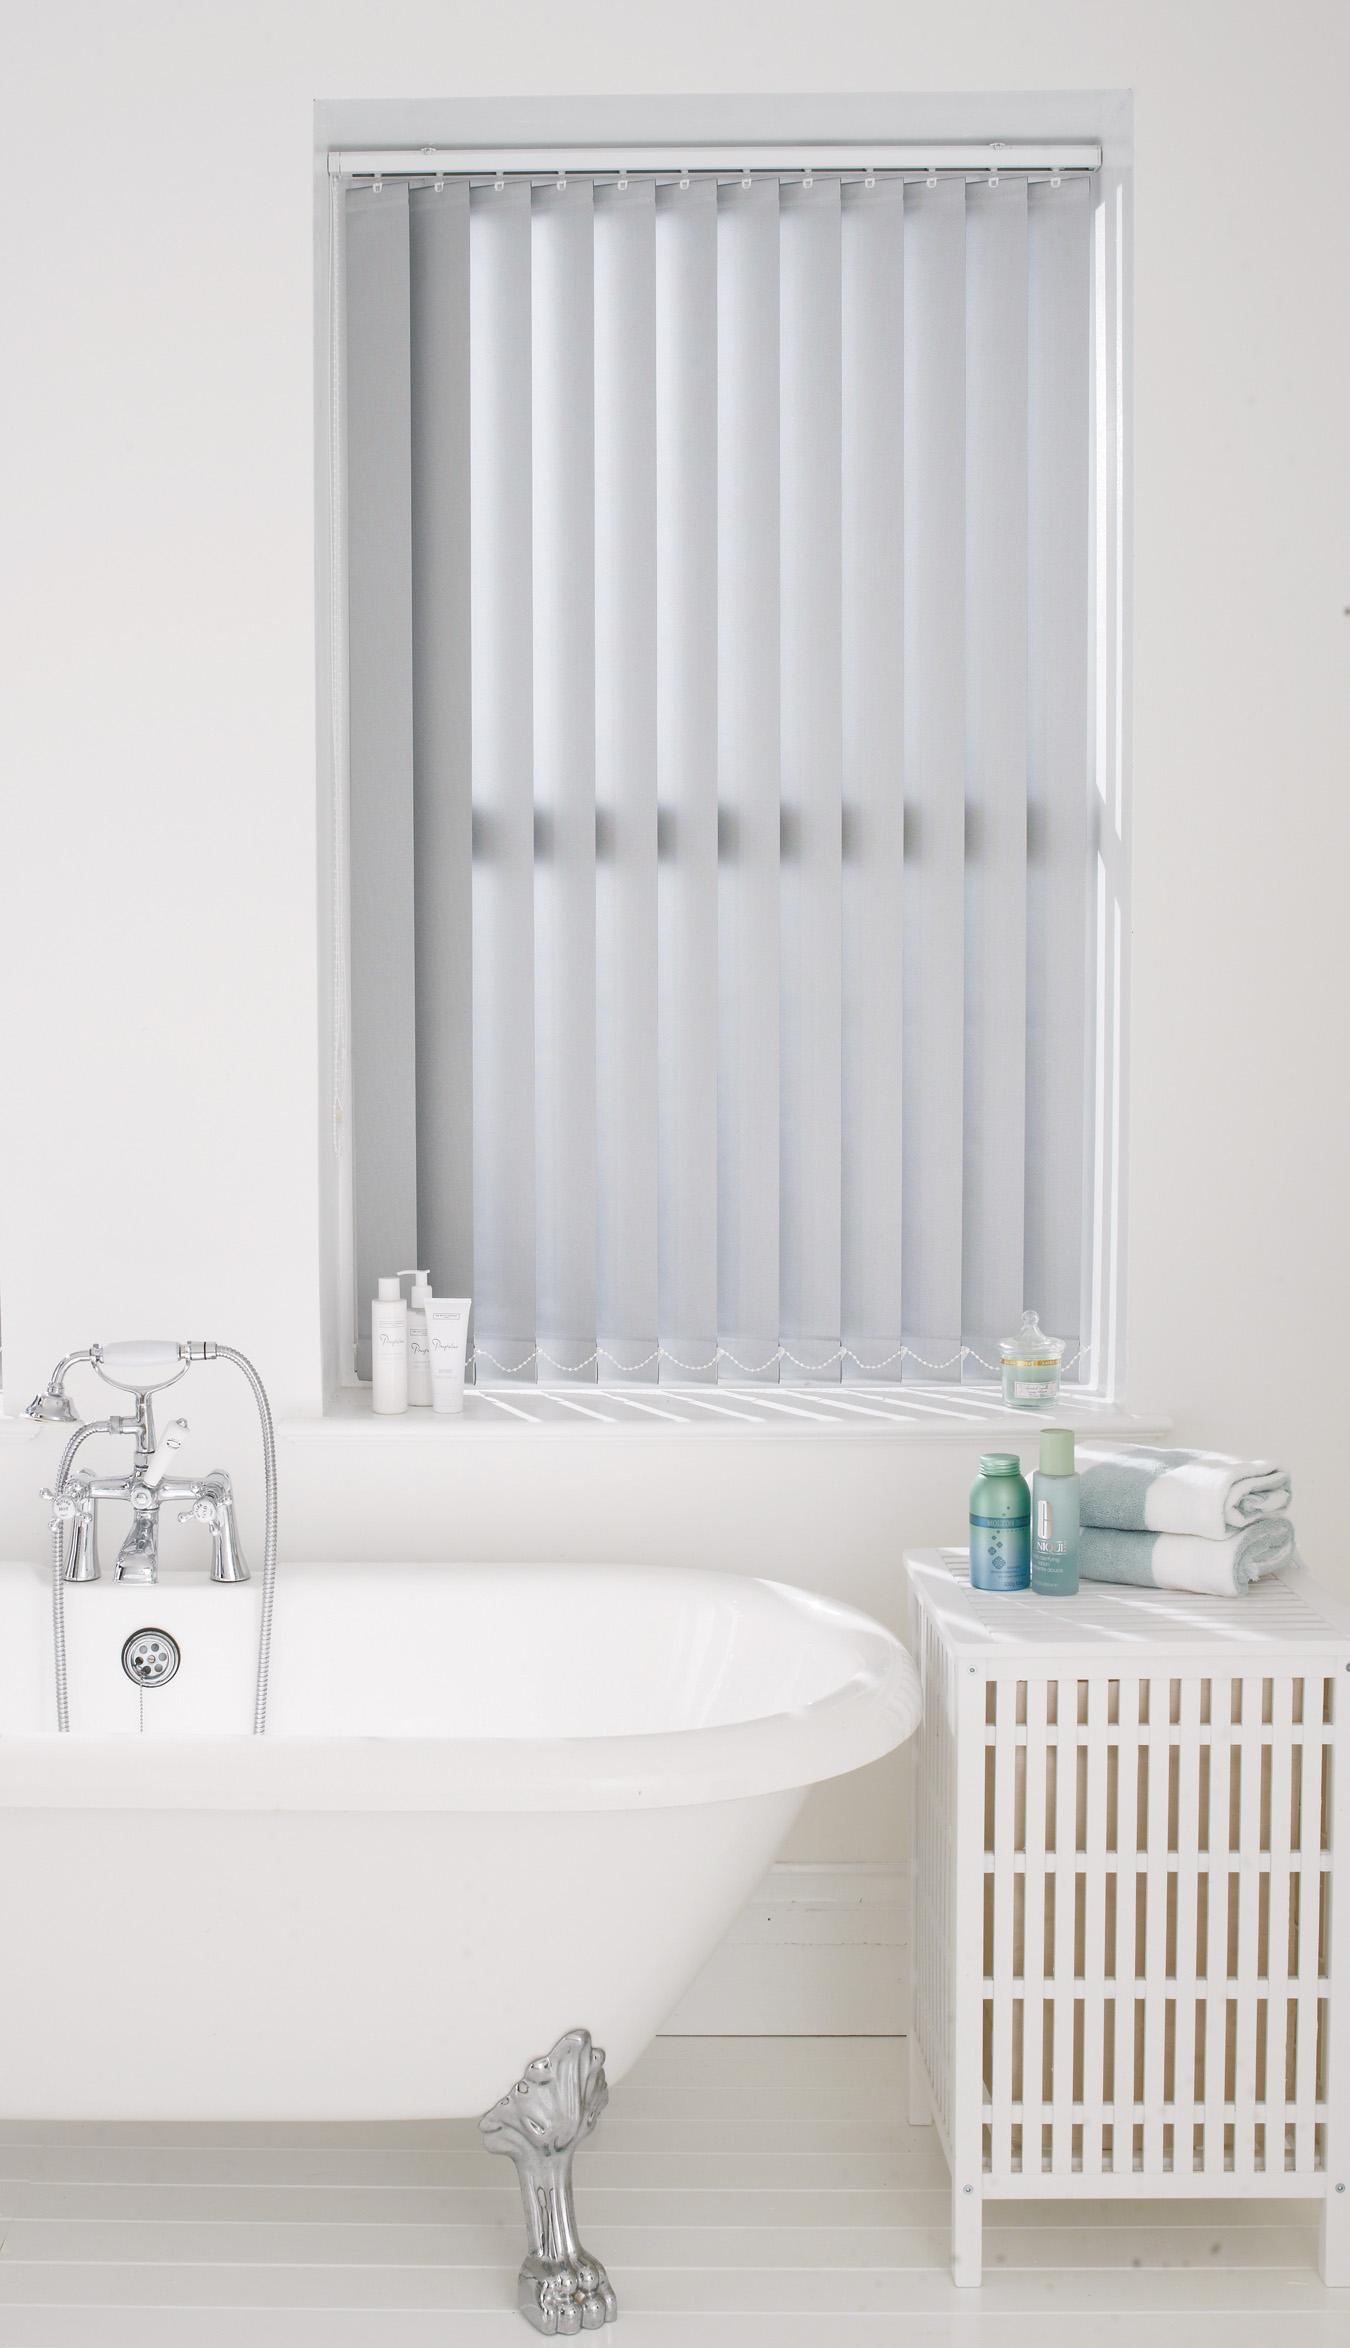 sod photo bisque blinds bathroom life real rathfarnham photos vienna window gallery shutters